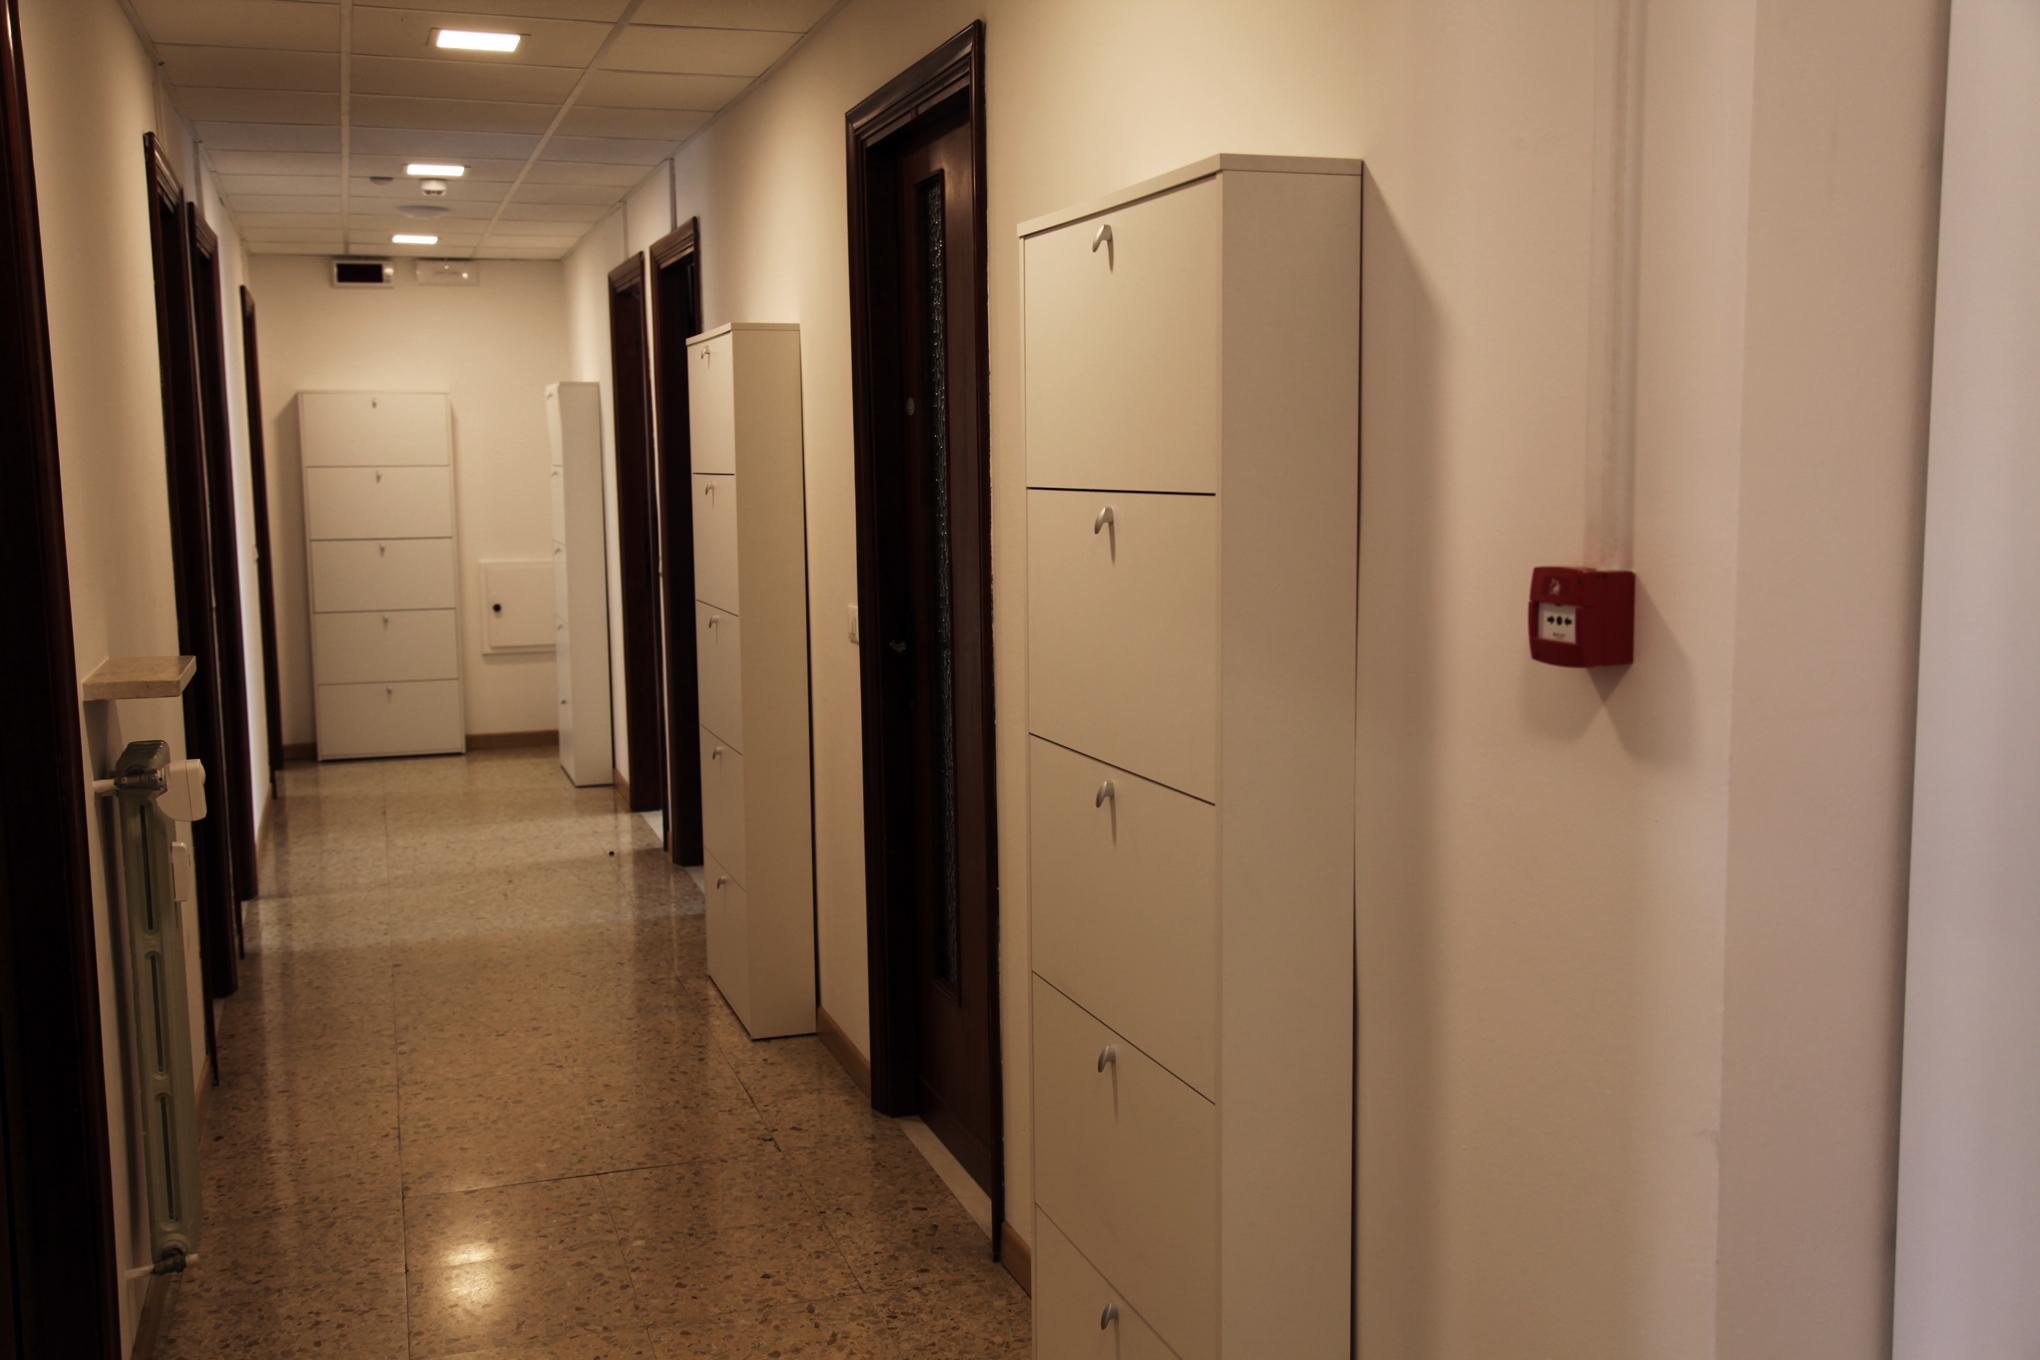 Cabina Armadio Da Corridoio : Armadi da corridoio cabina armadio per camera e ingresso armadio